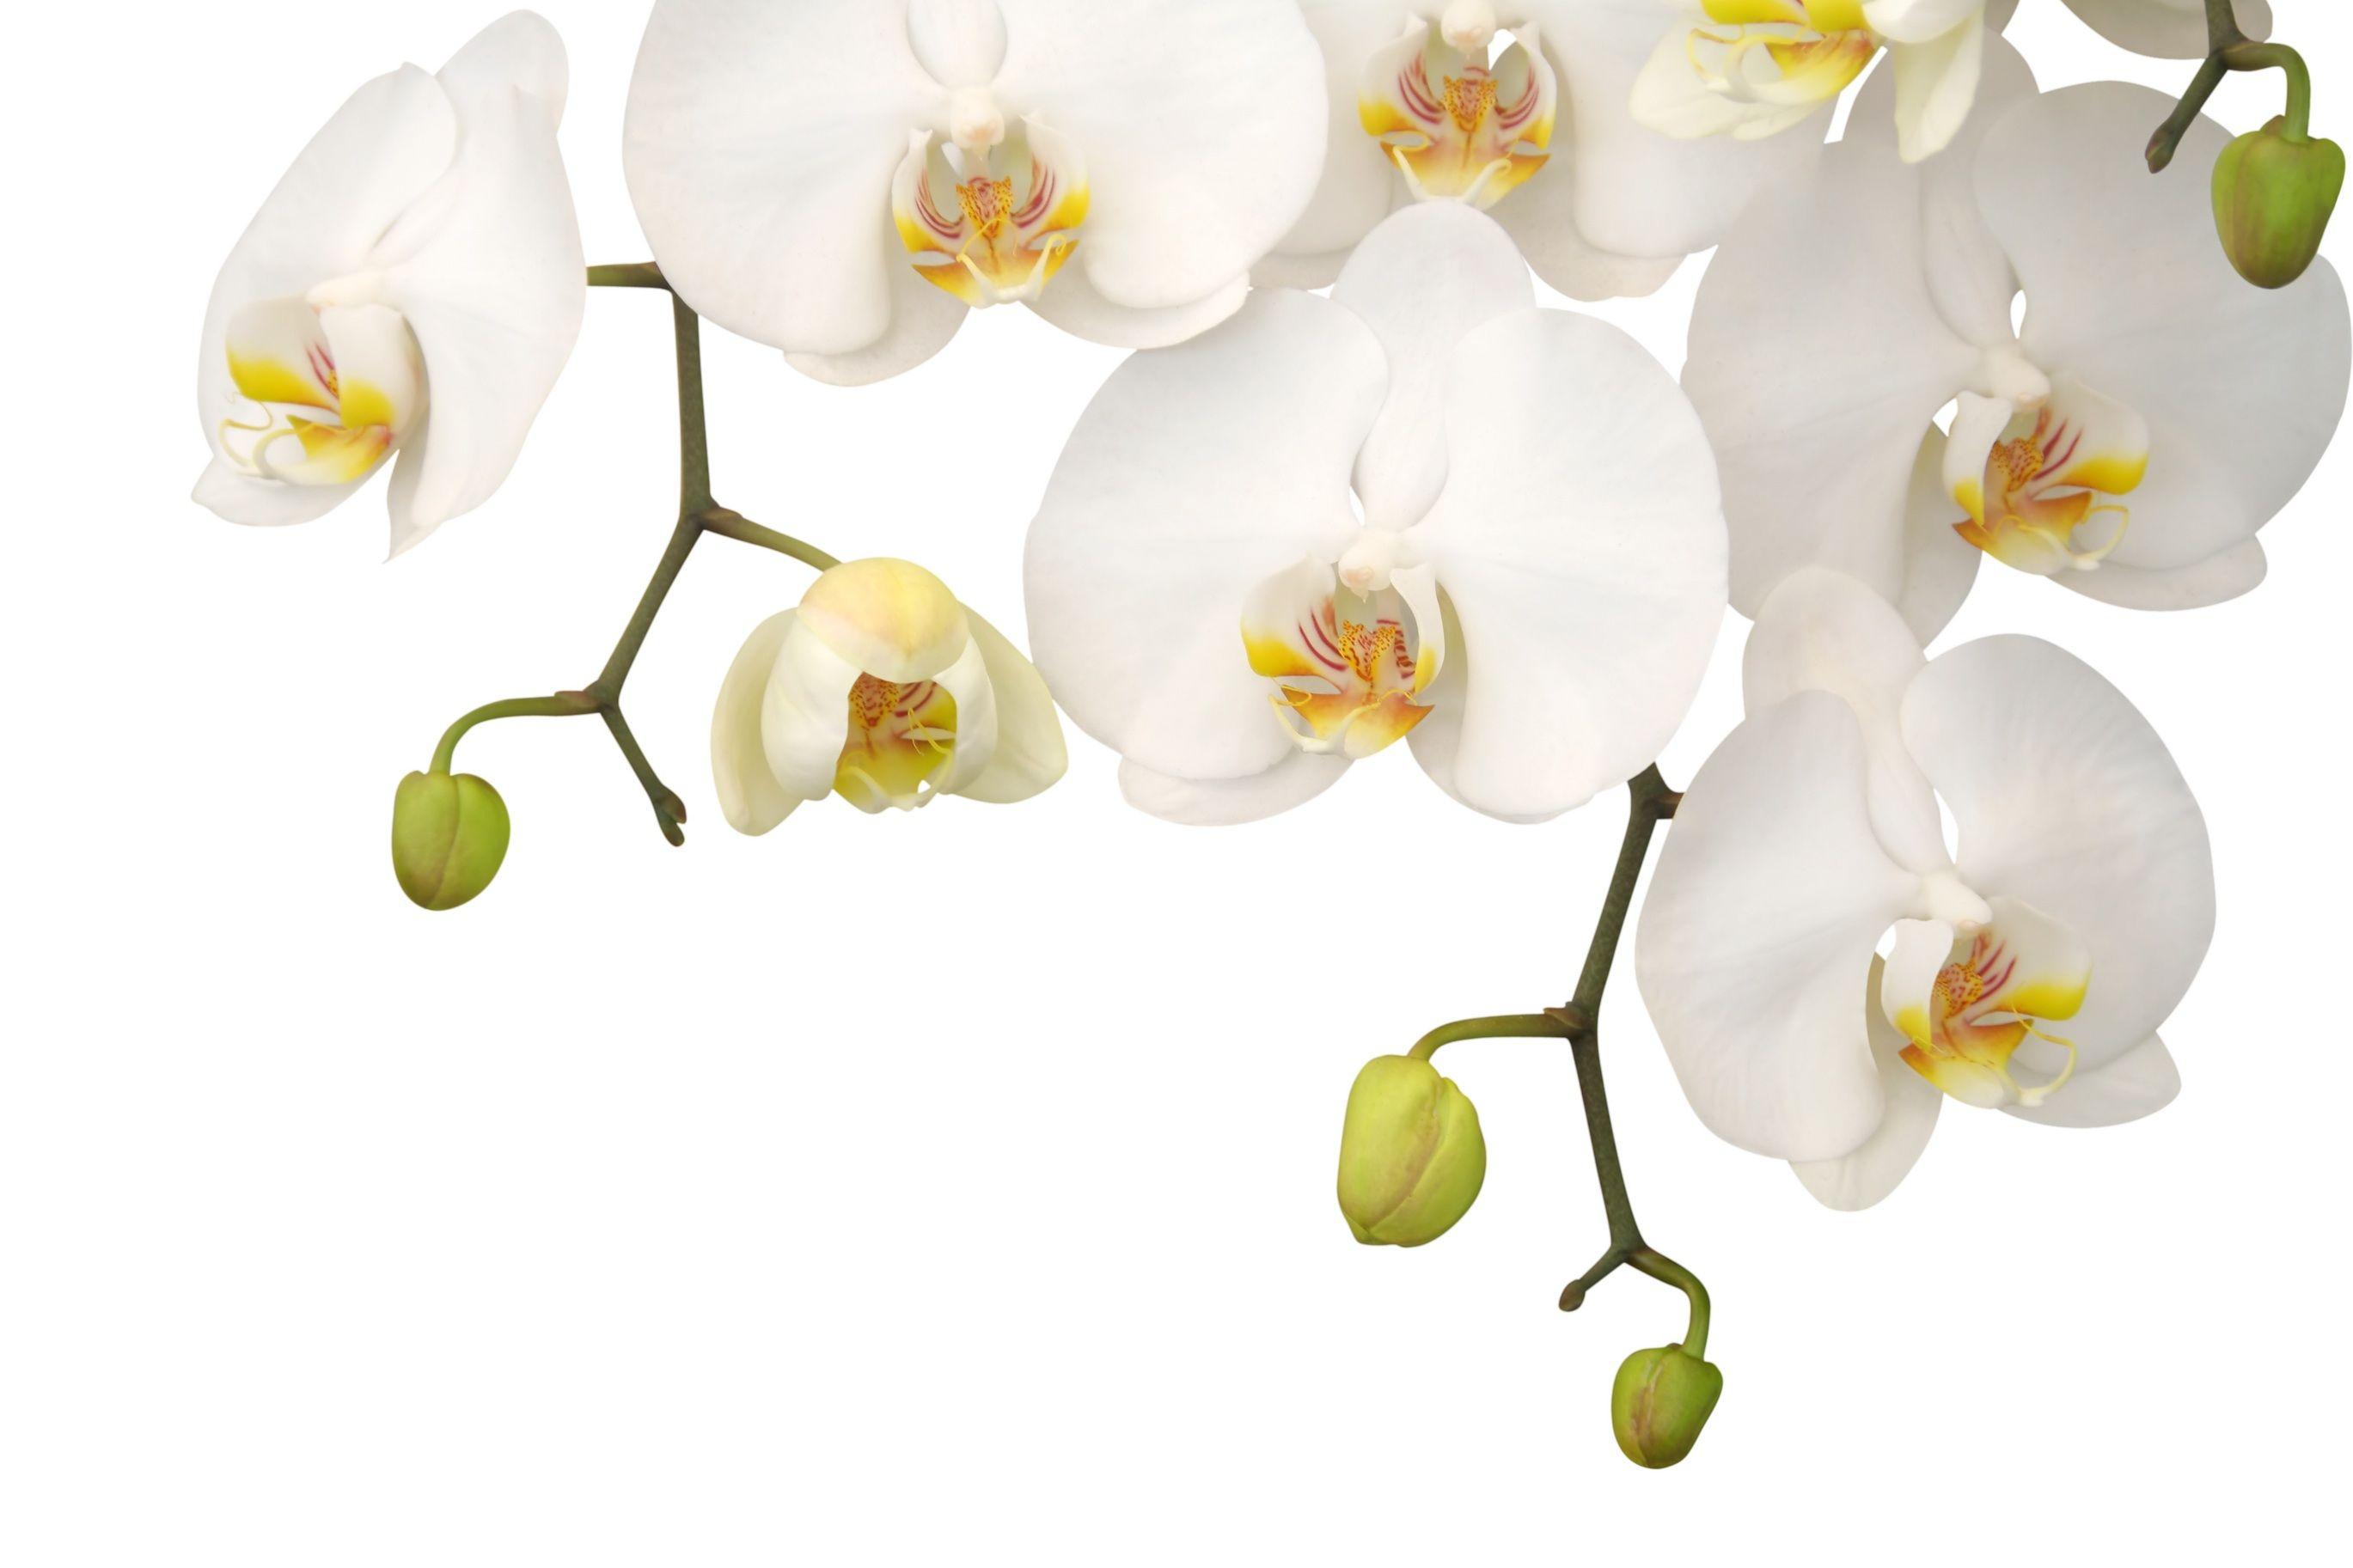 Kartinki Po Zaprosu Klipart Svadebnyj Orchids White Orchids Orchid Photography